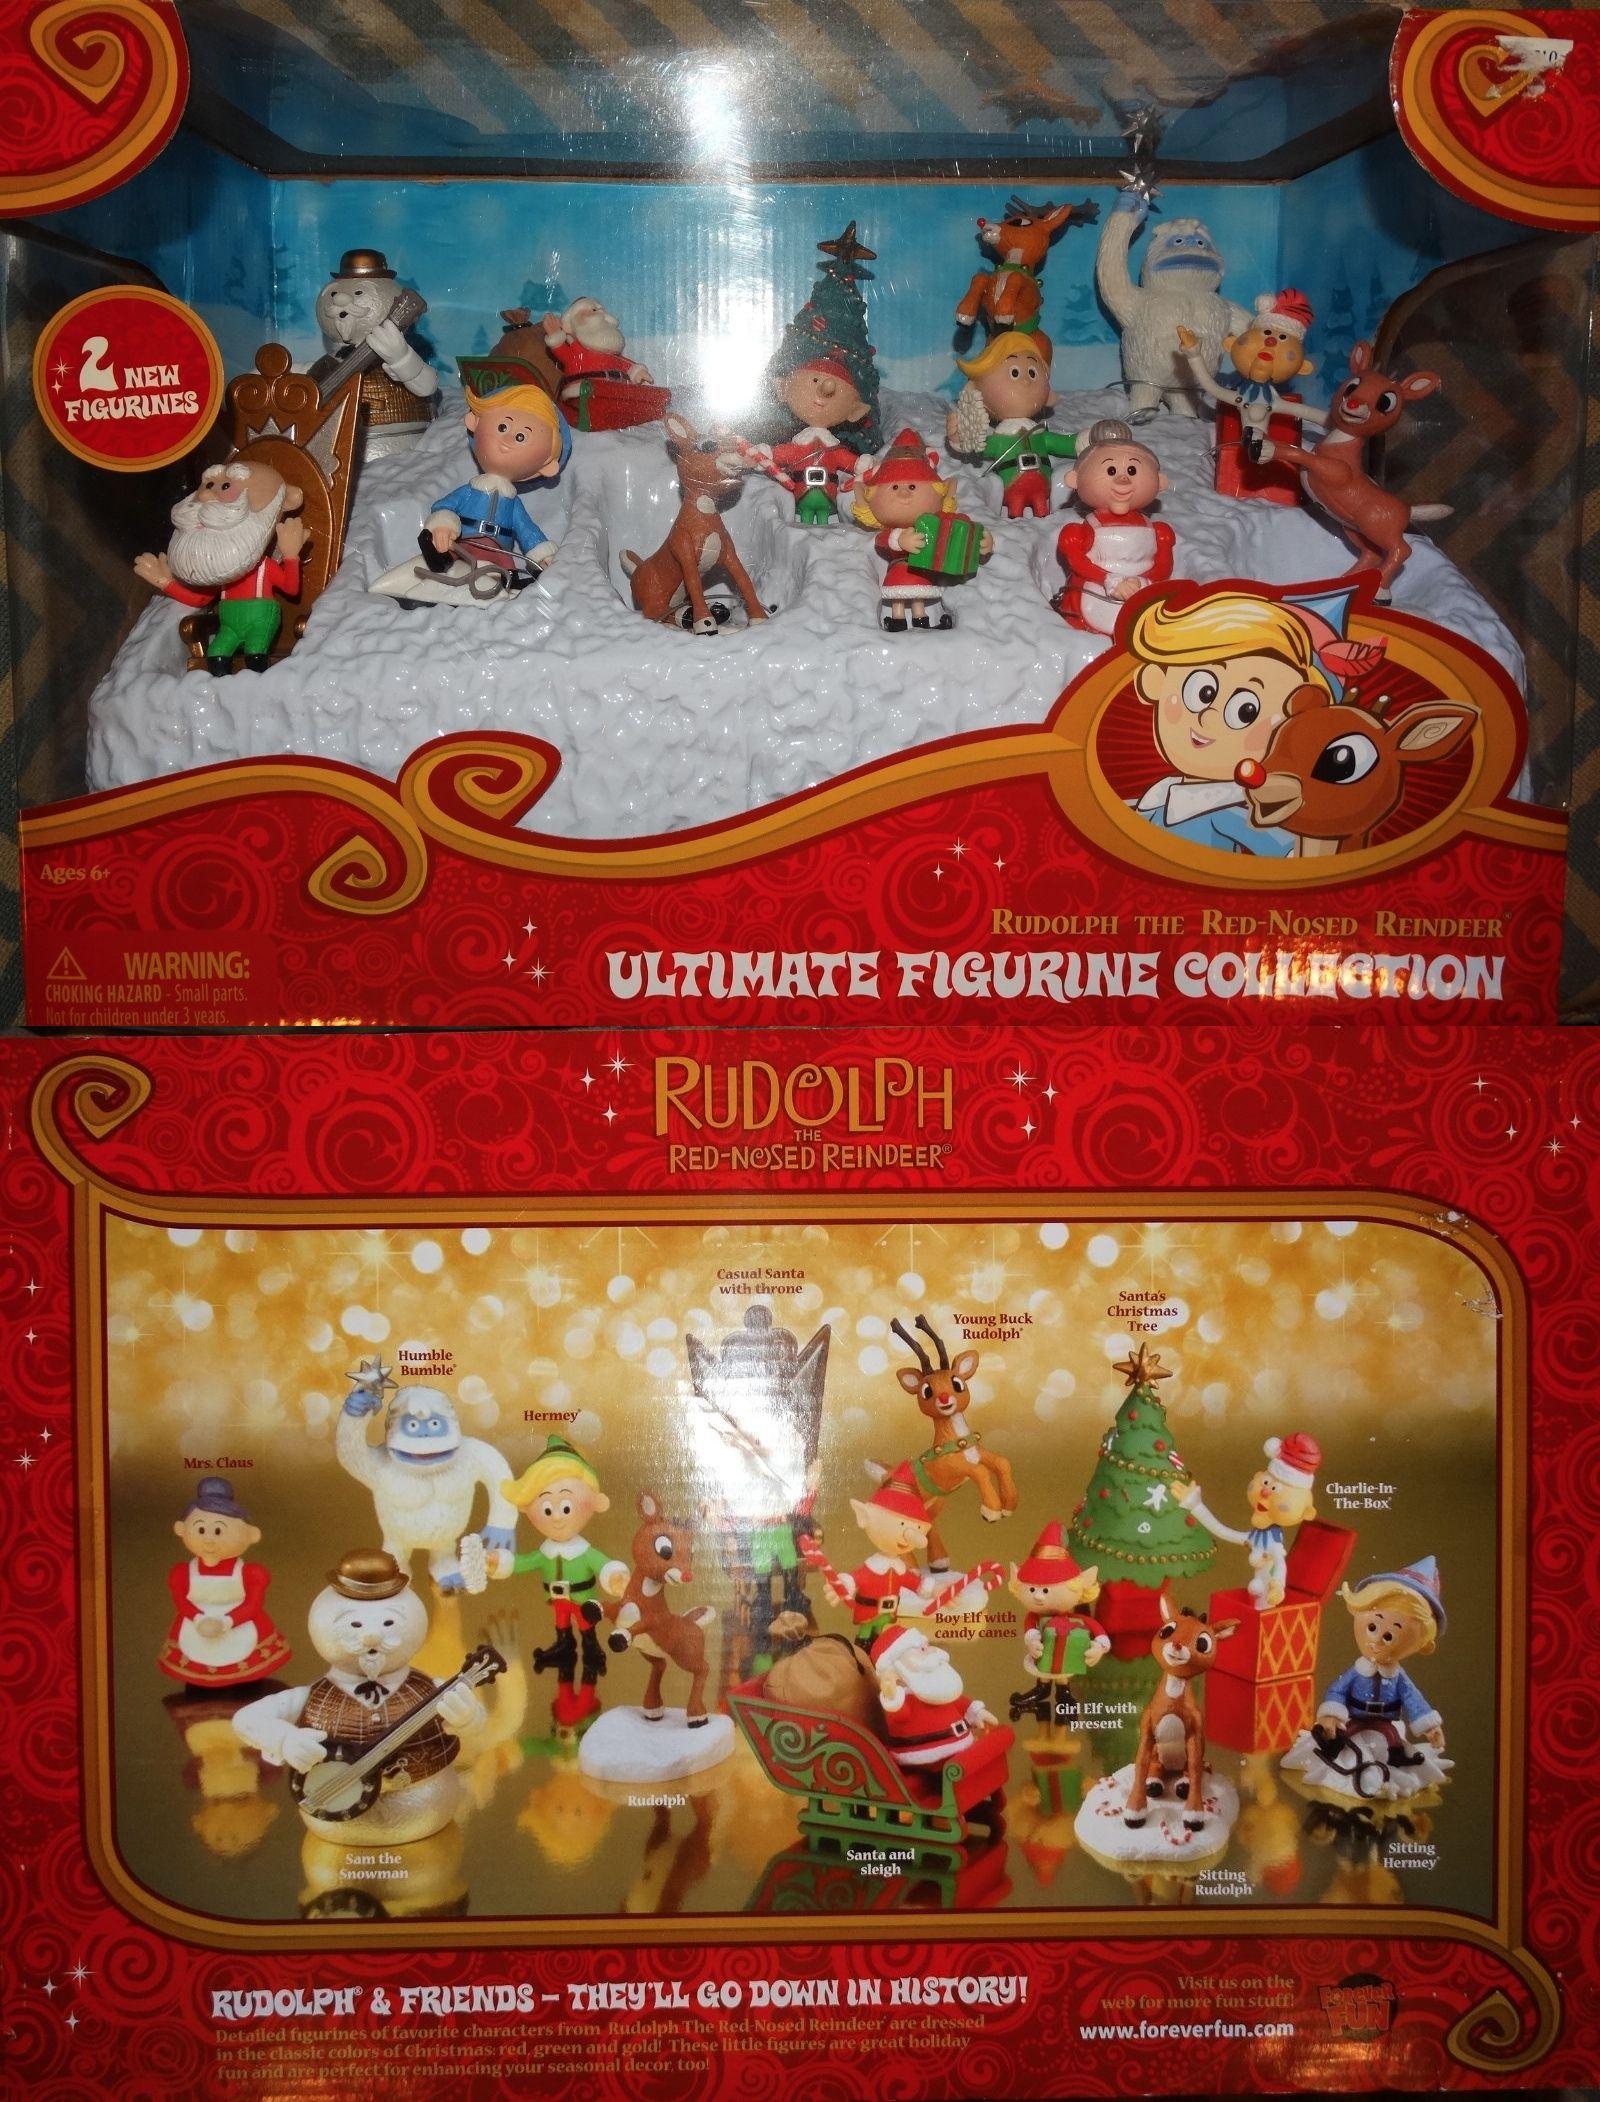 Rudolph 95252: New Rudolph Ultimate Figurine Set Misfit Toys Pvc ...